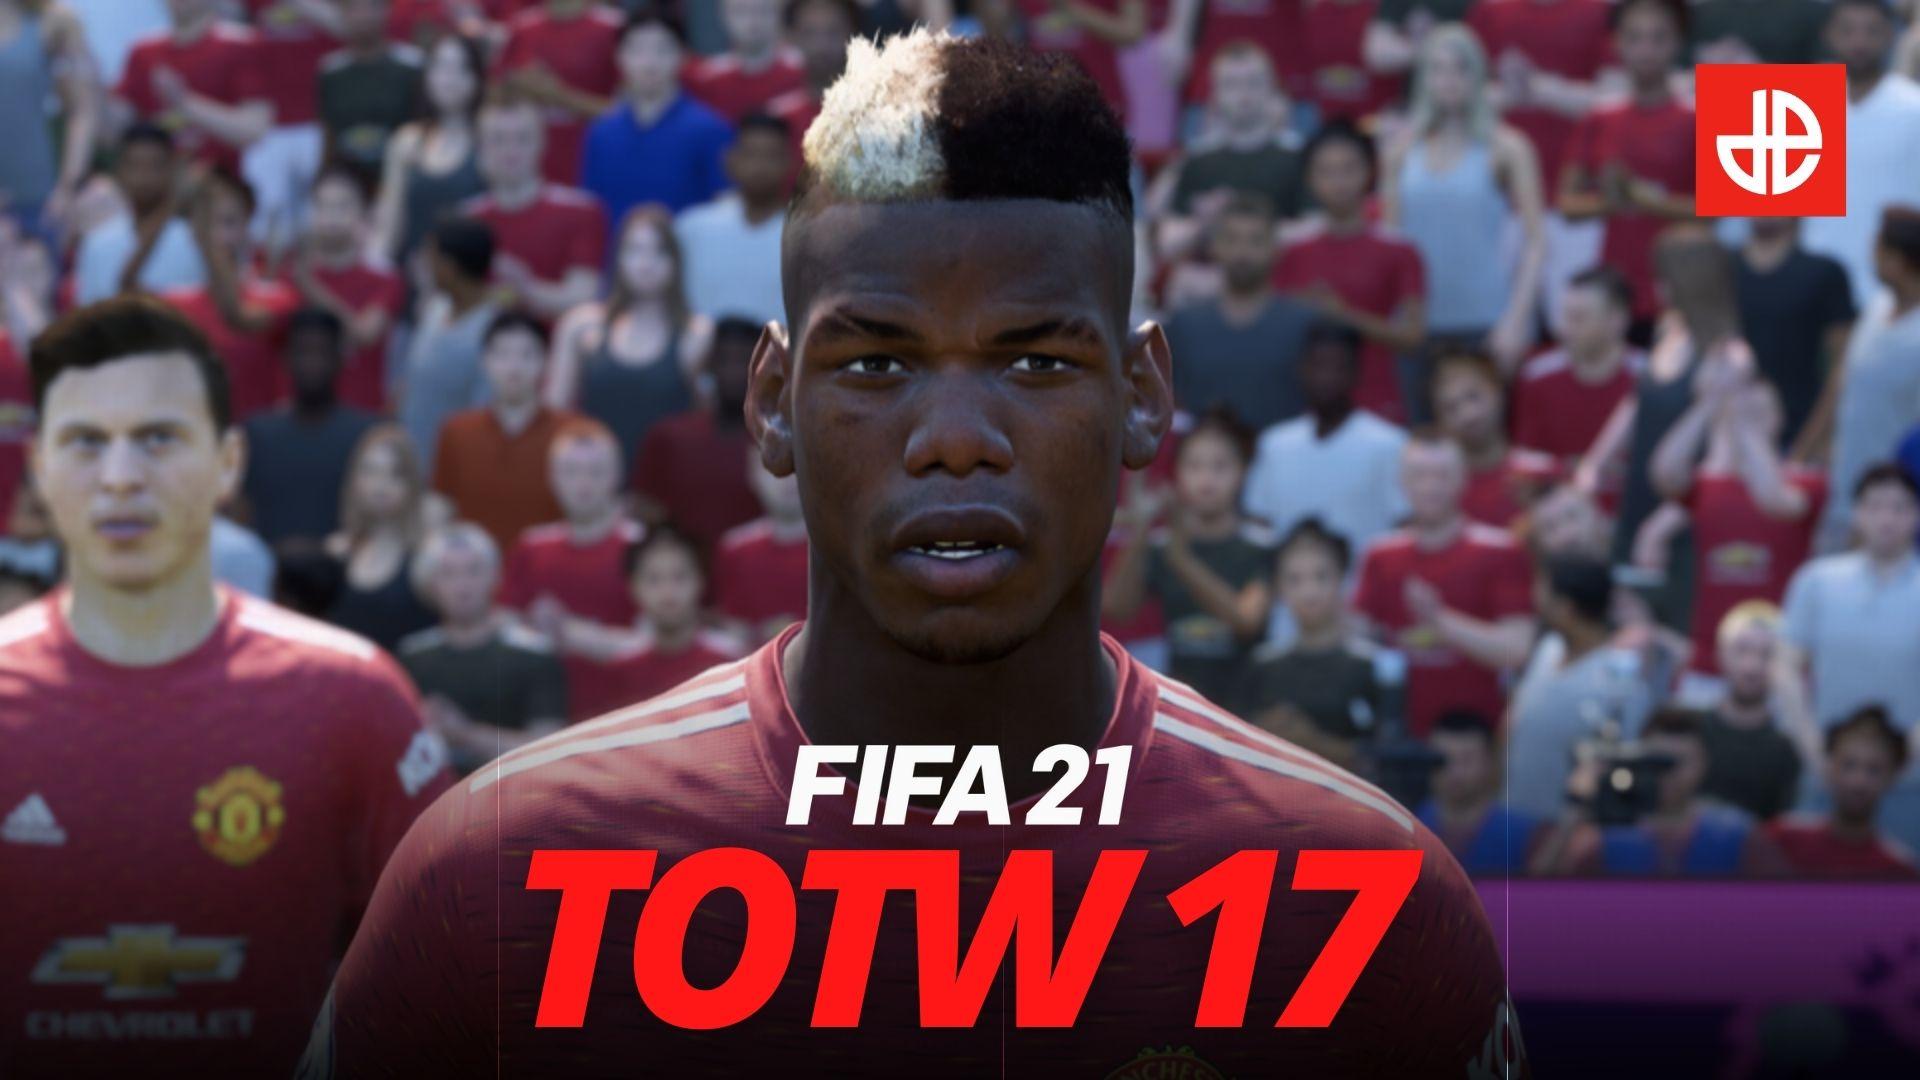 FIFA 21 totw 17 pogba